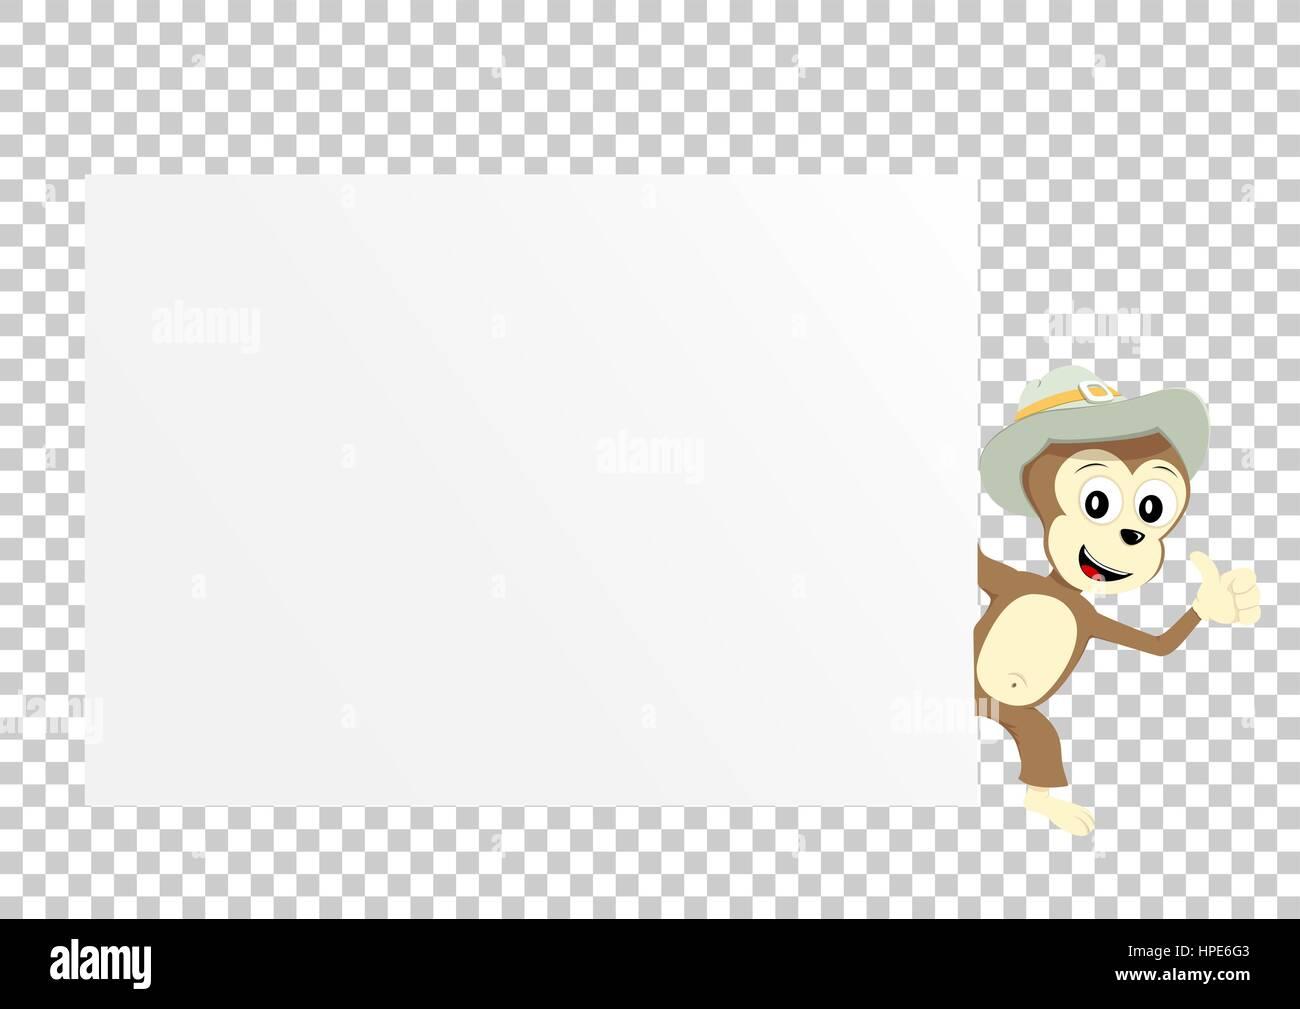 monkey paper transparent - Stock Image